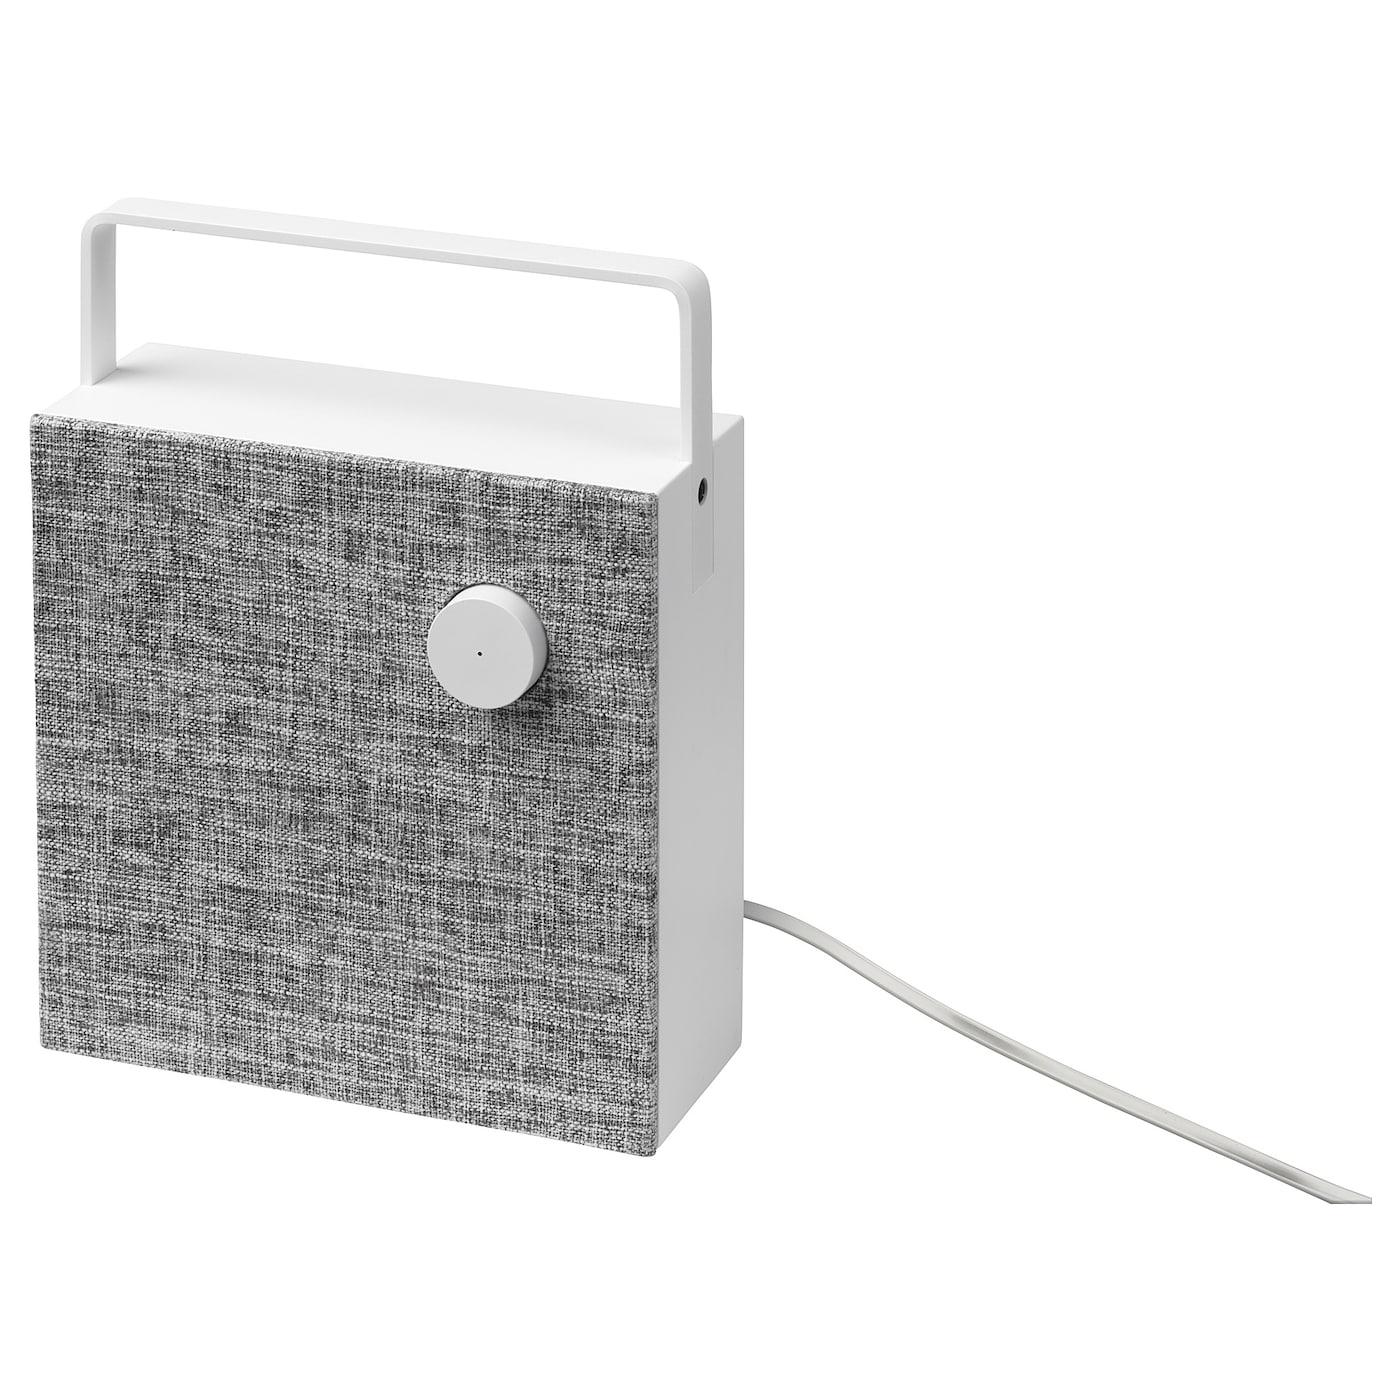 IKEA Eneby Speakers $24.50